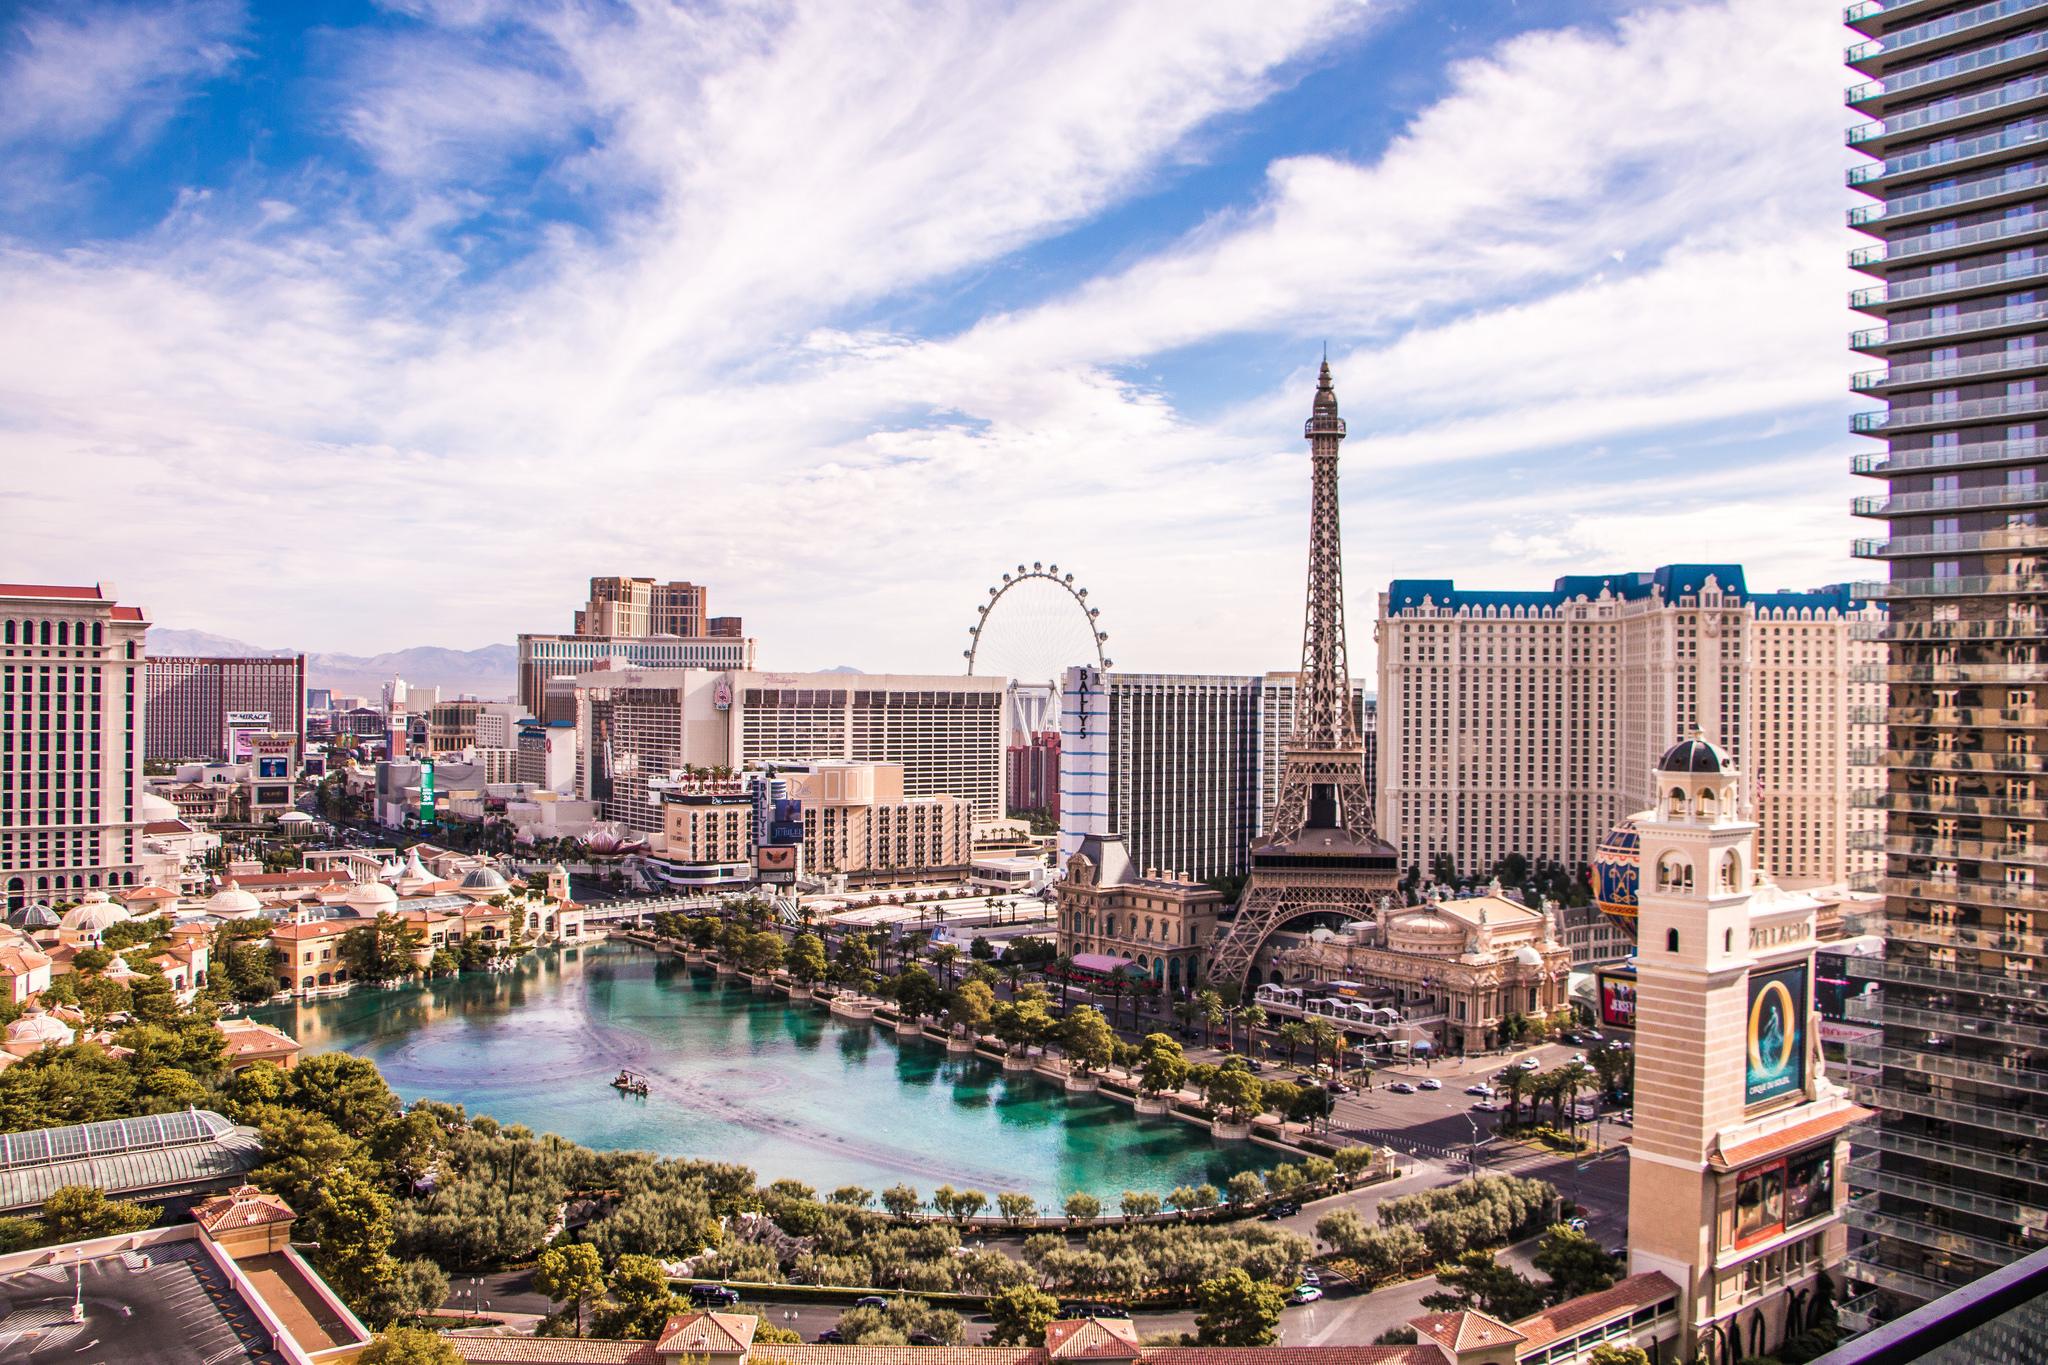 100 things to do in Las Vegas